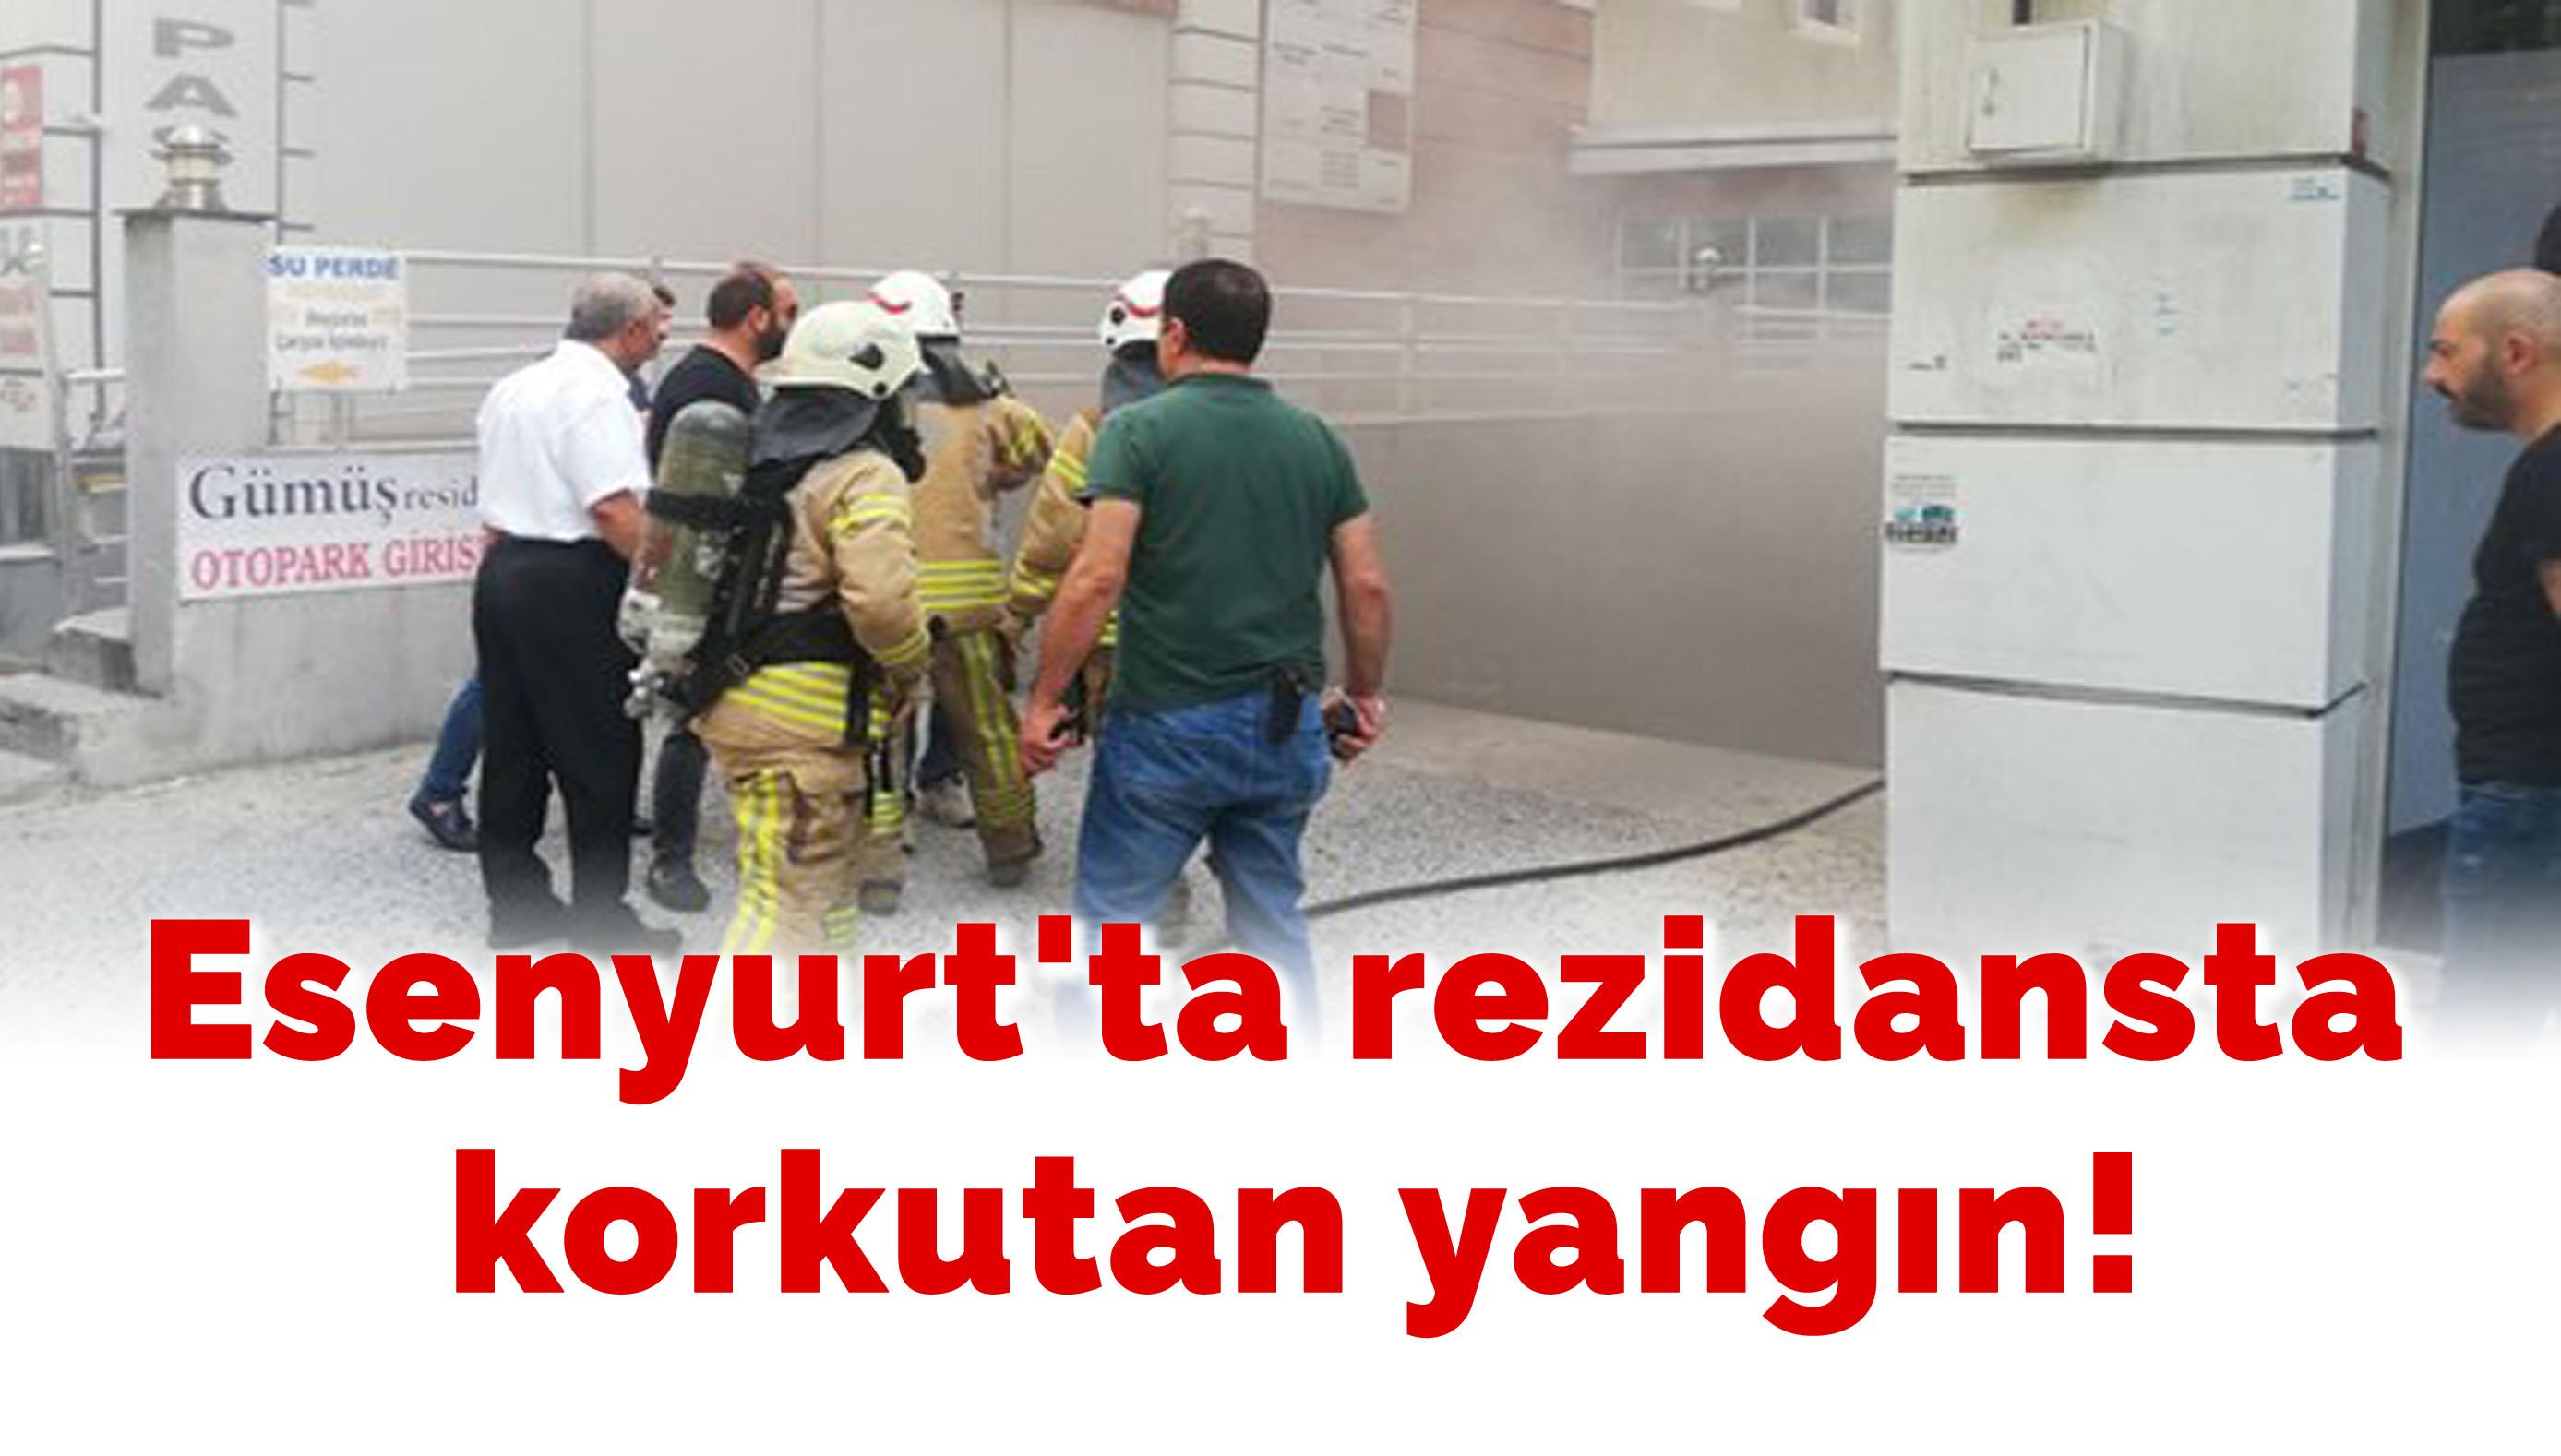 Esenyurt'ta rezidansta korkutan yangın!